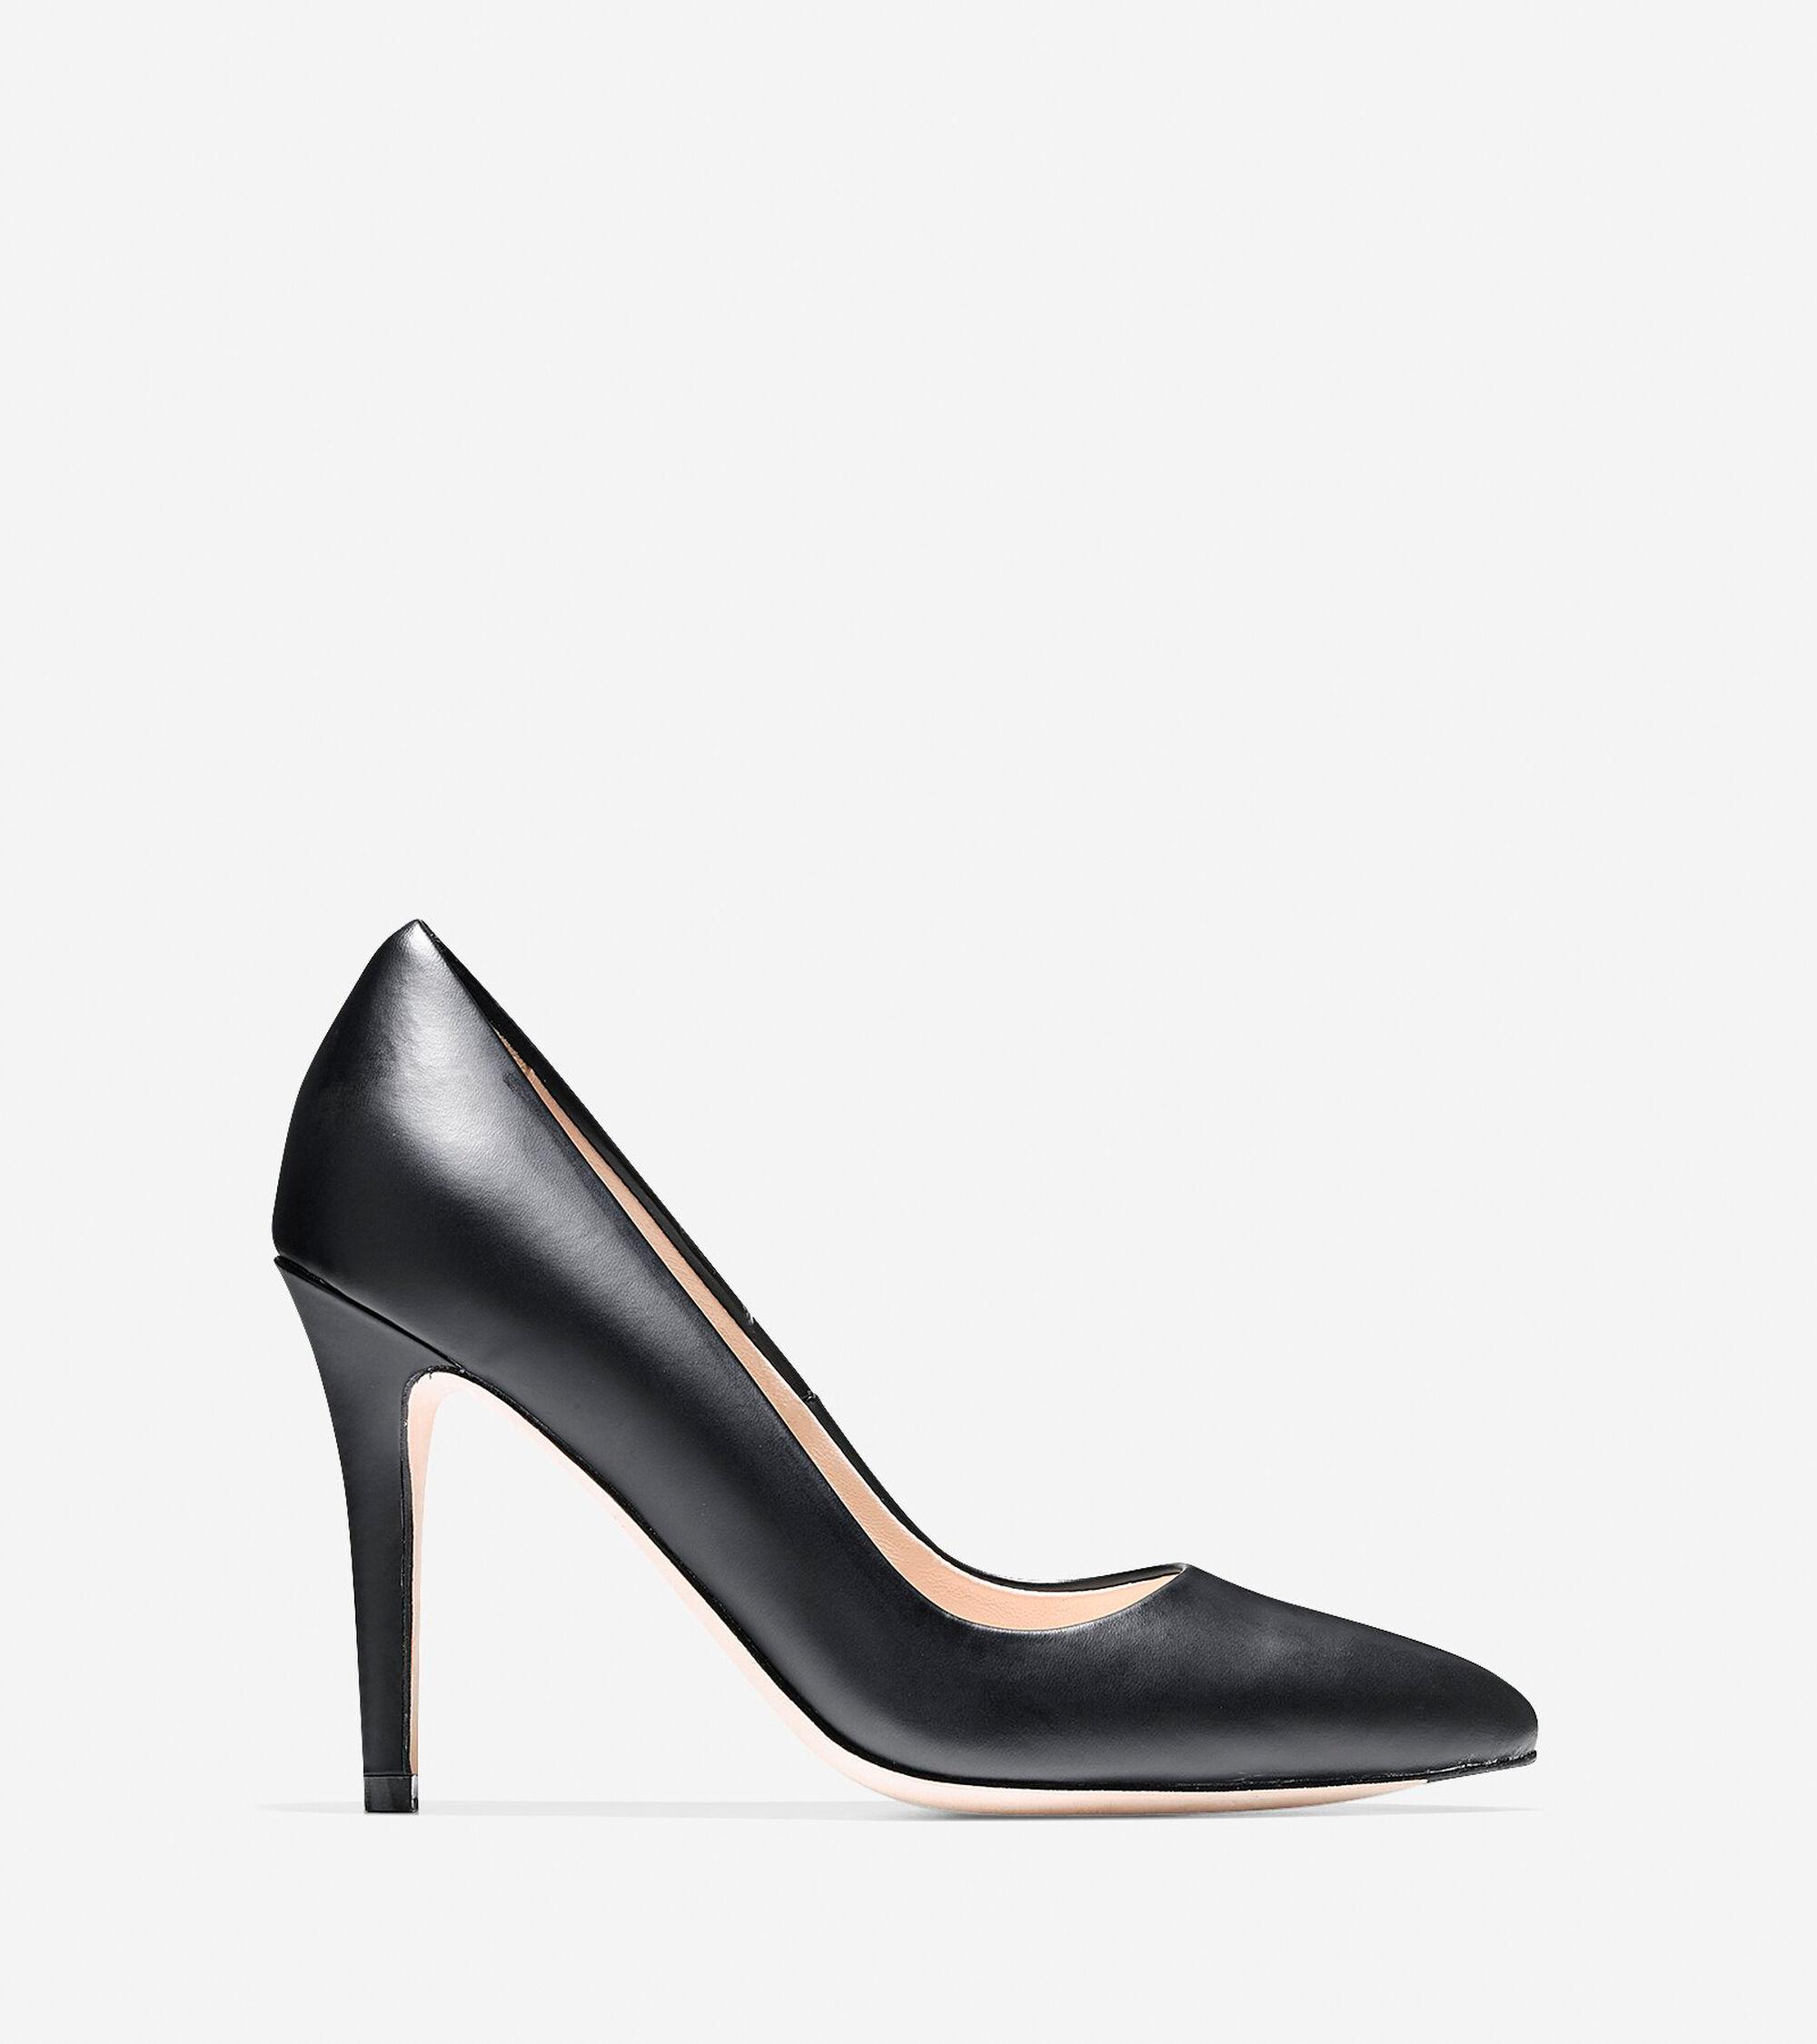 Shoes > Emery Pump (100mm) - Almond Toe